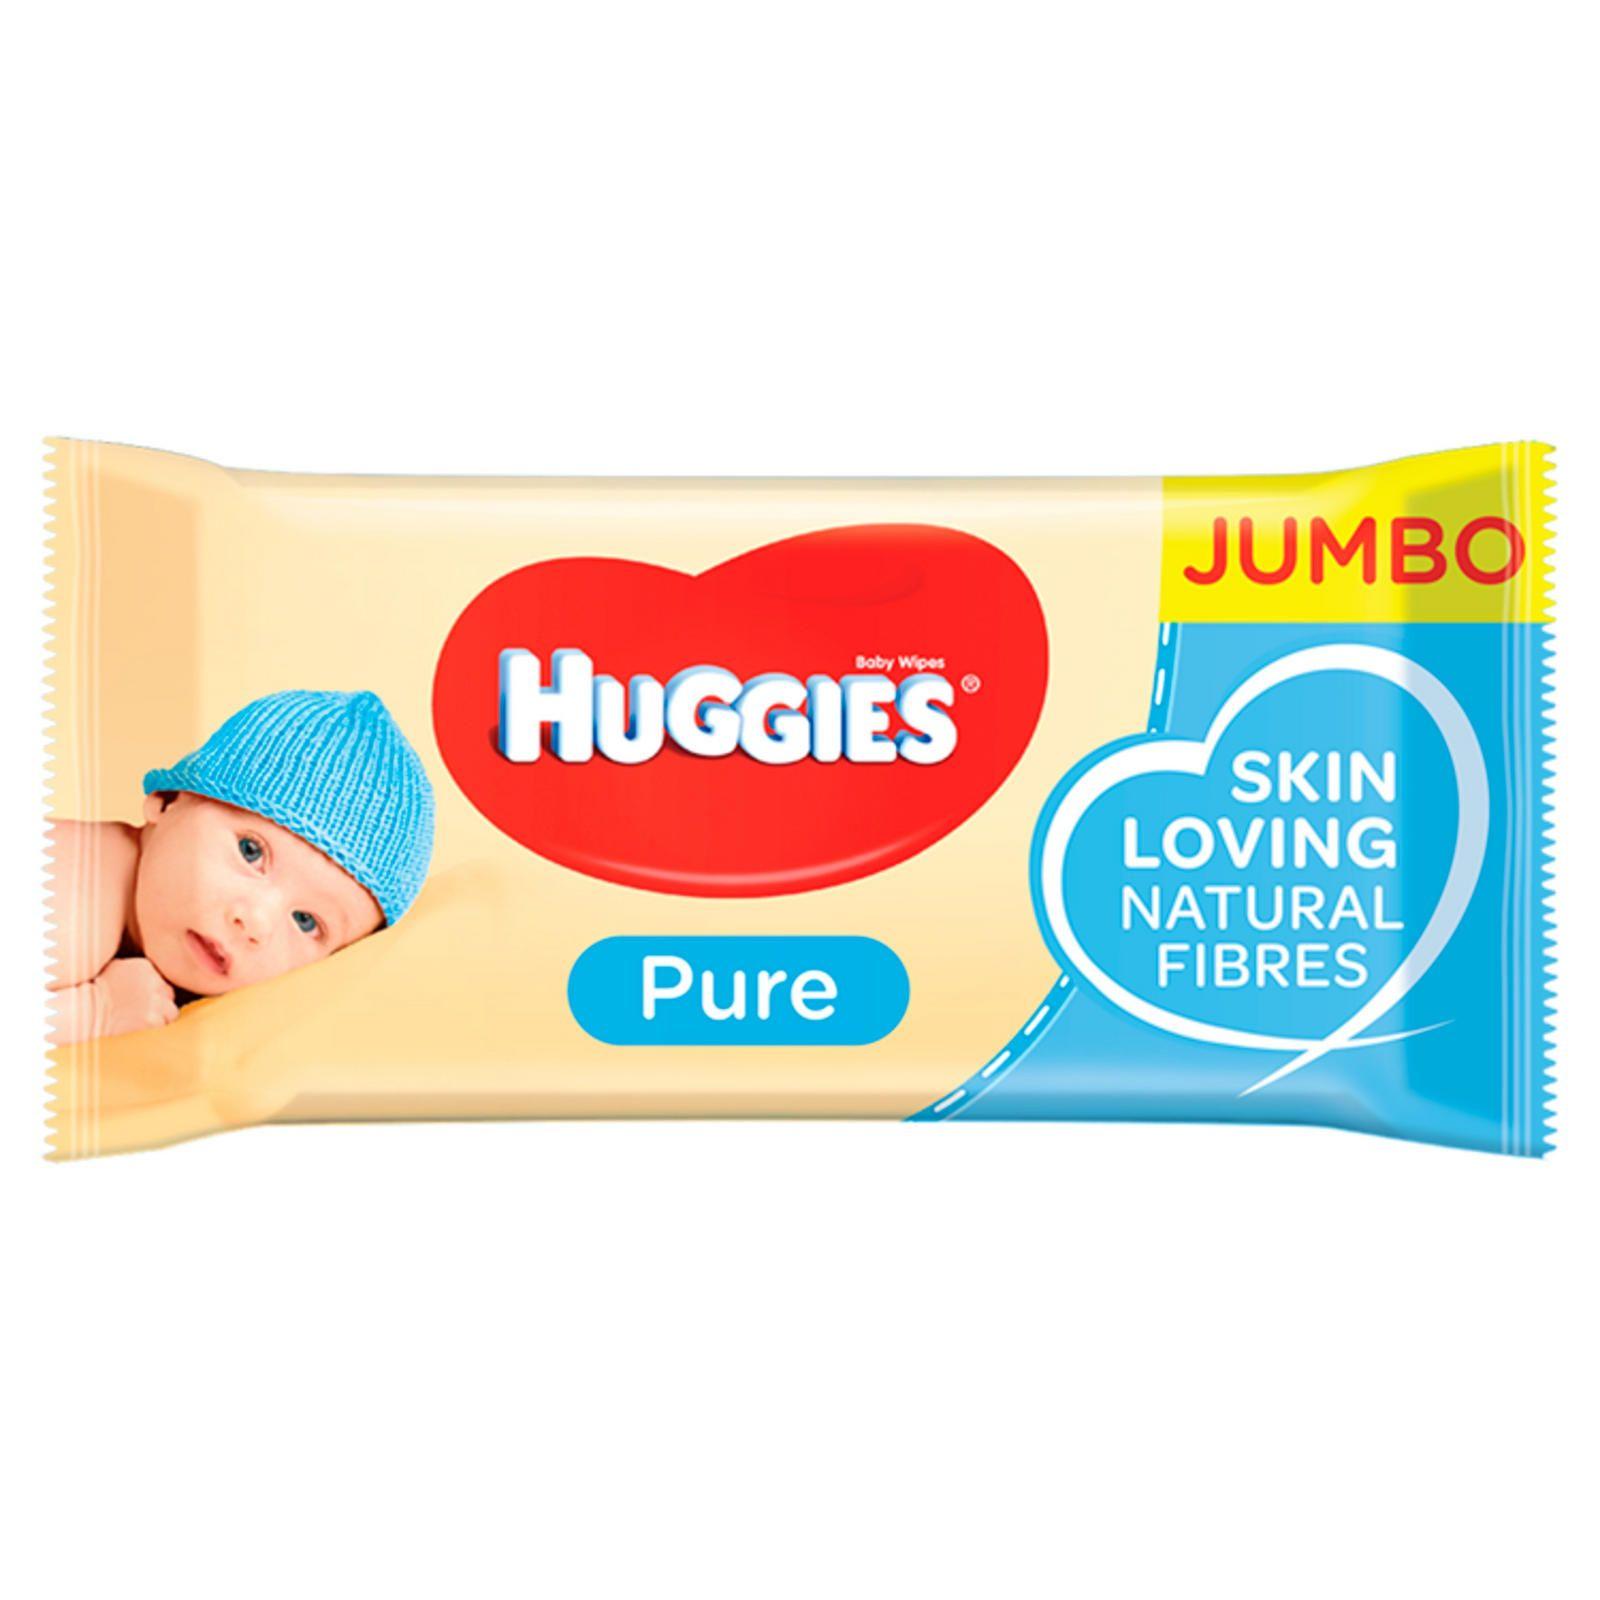 Huggies® Pure Baby Wipes - Jumbo Pack (72 Wipes/Pack) £0.79 @ Homebargains (Glasgow (Newton Mearns))